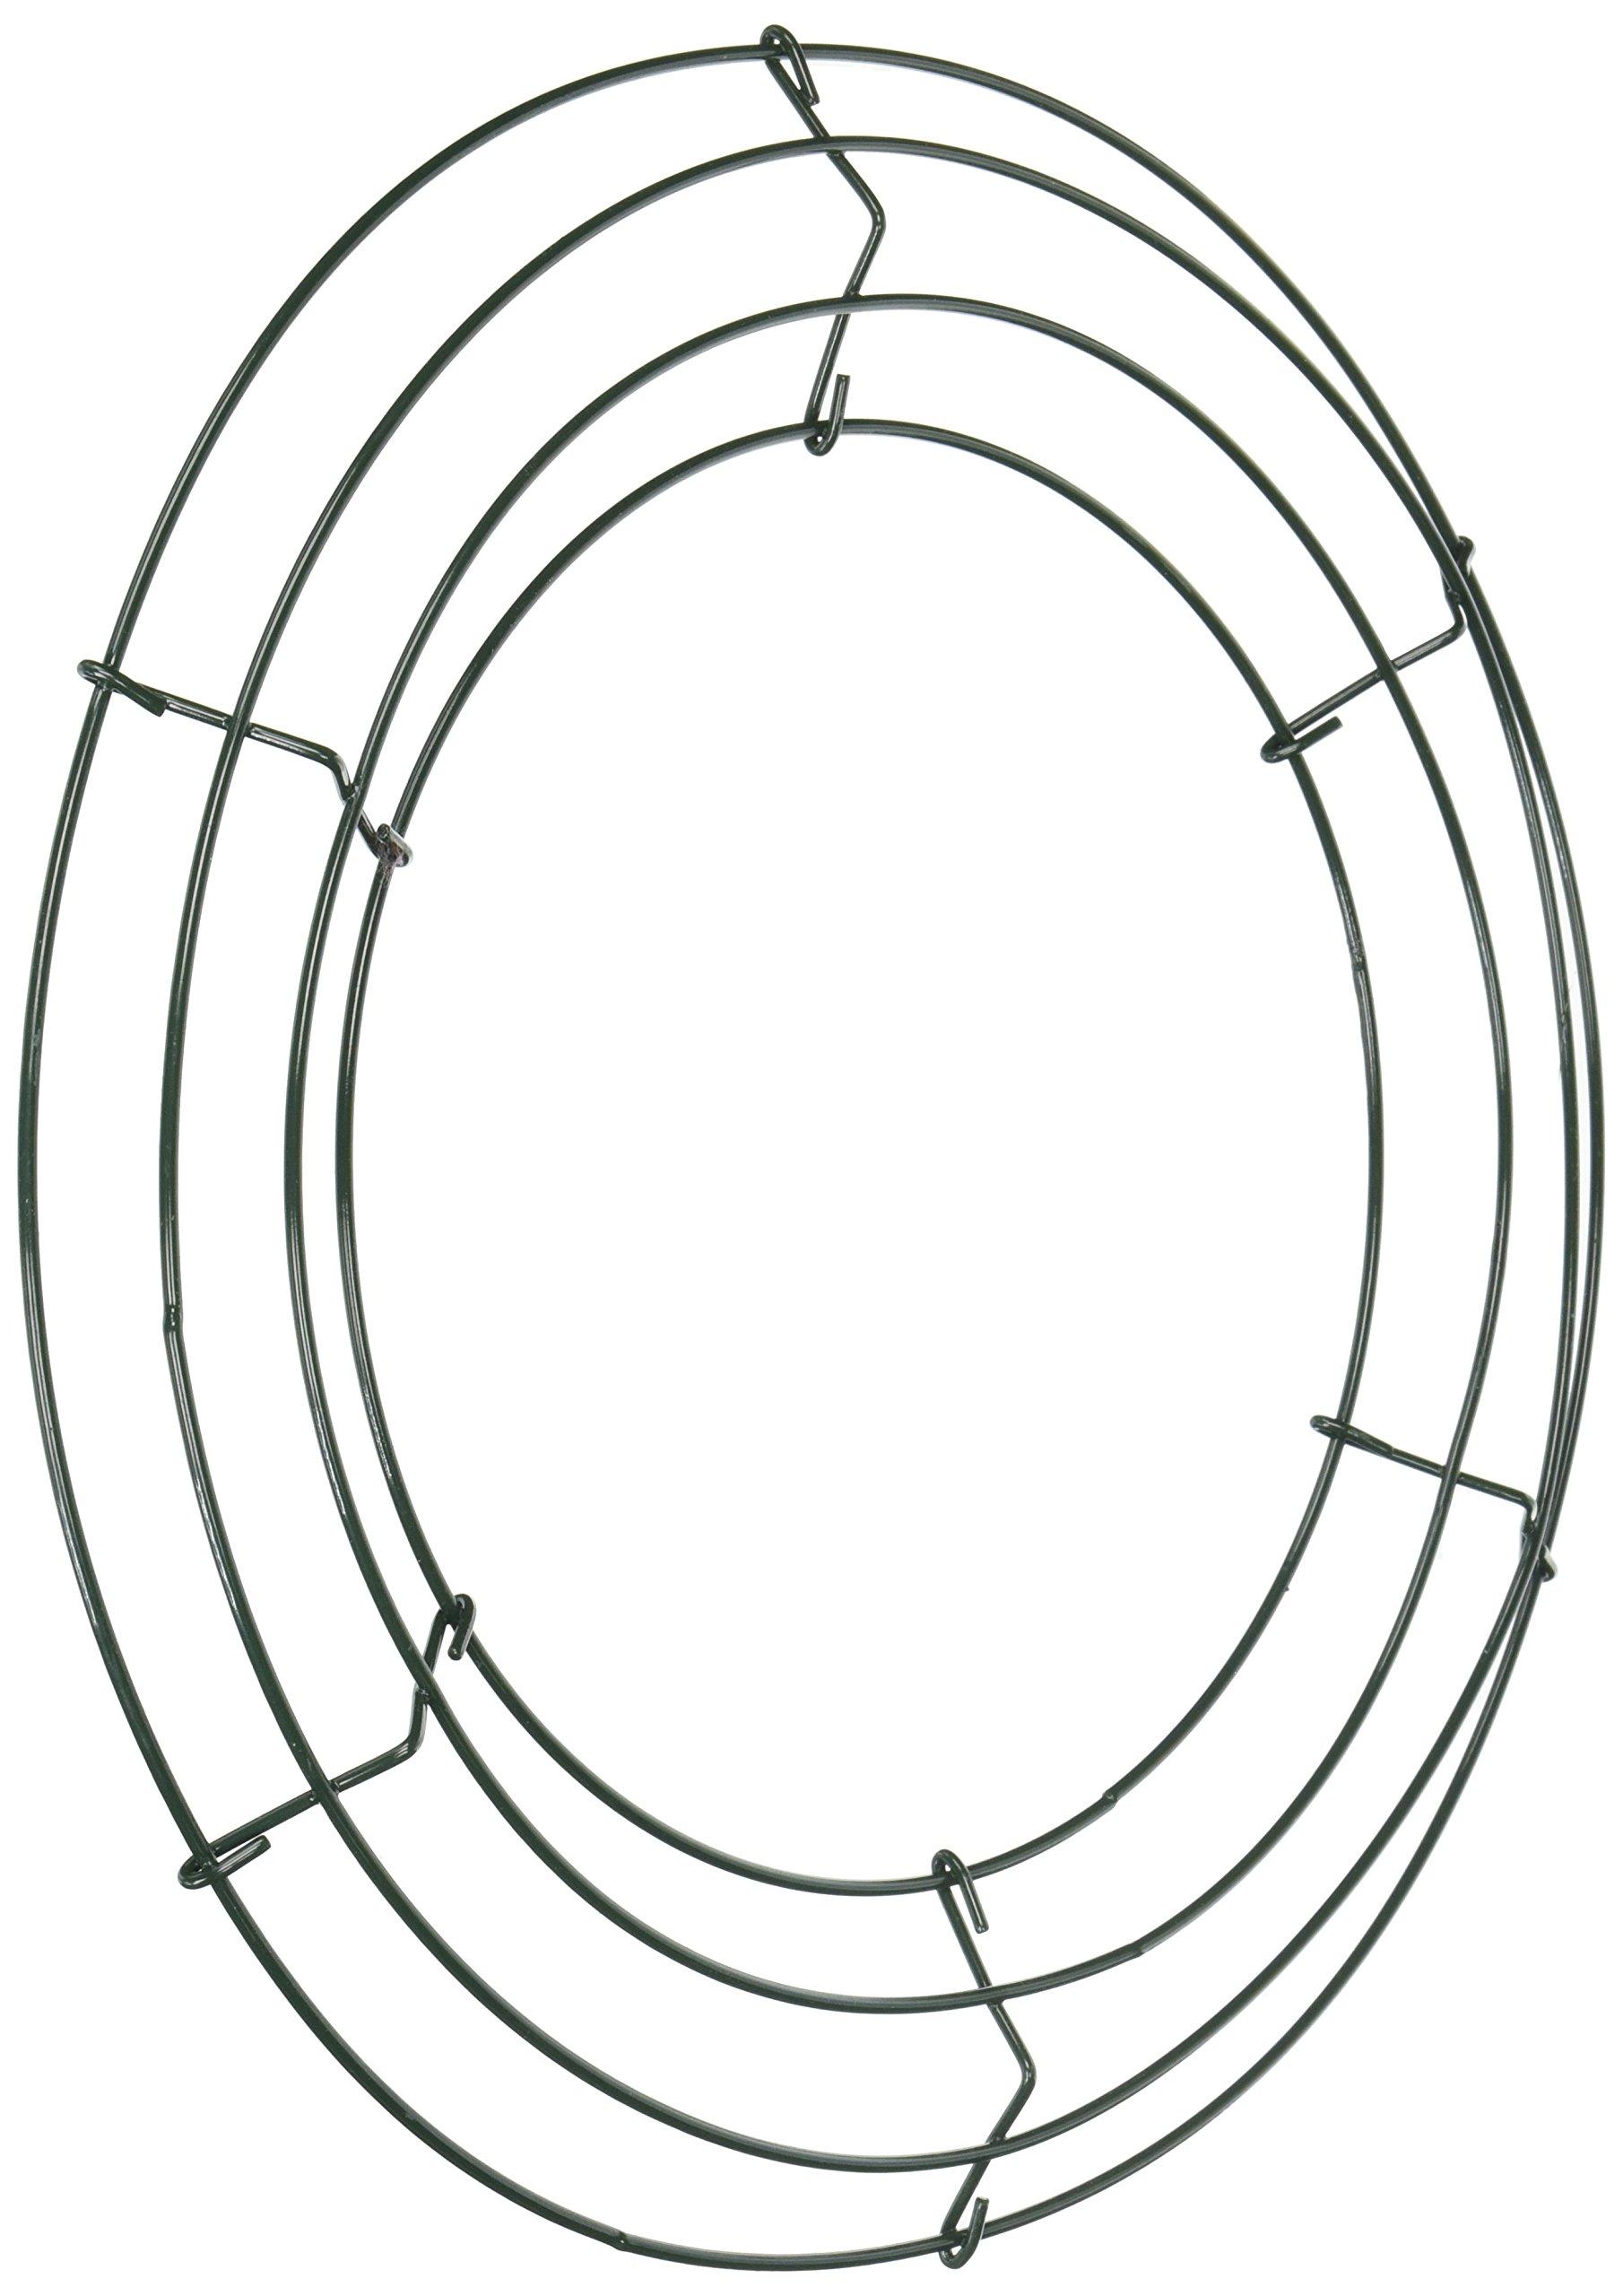 Panacea-36003-Wire-Wreath-Frame-12-Green